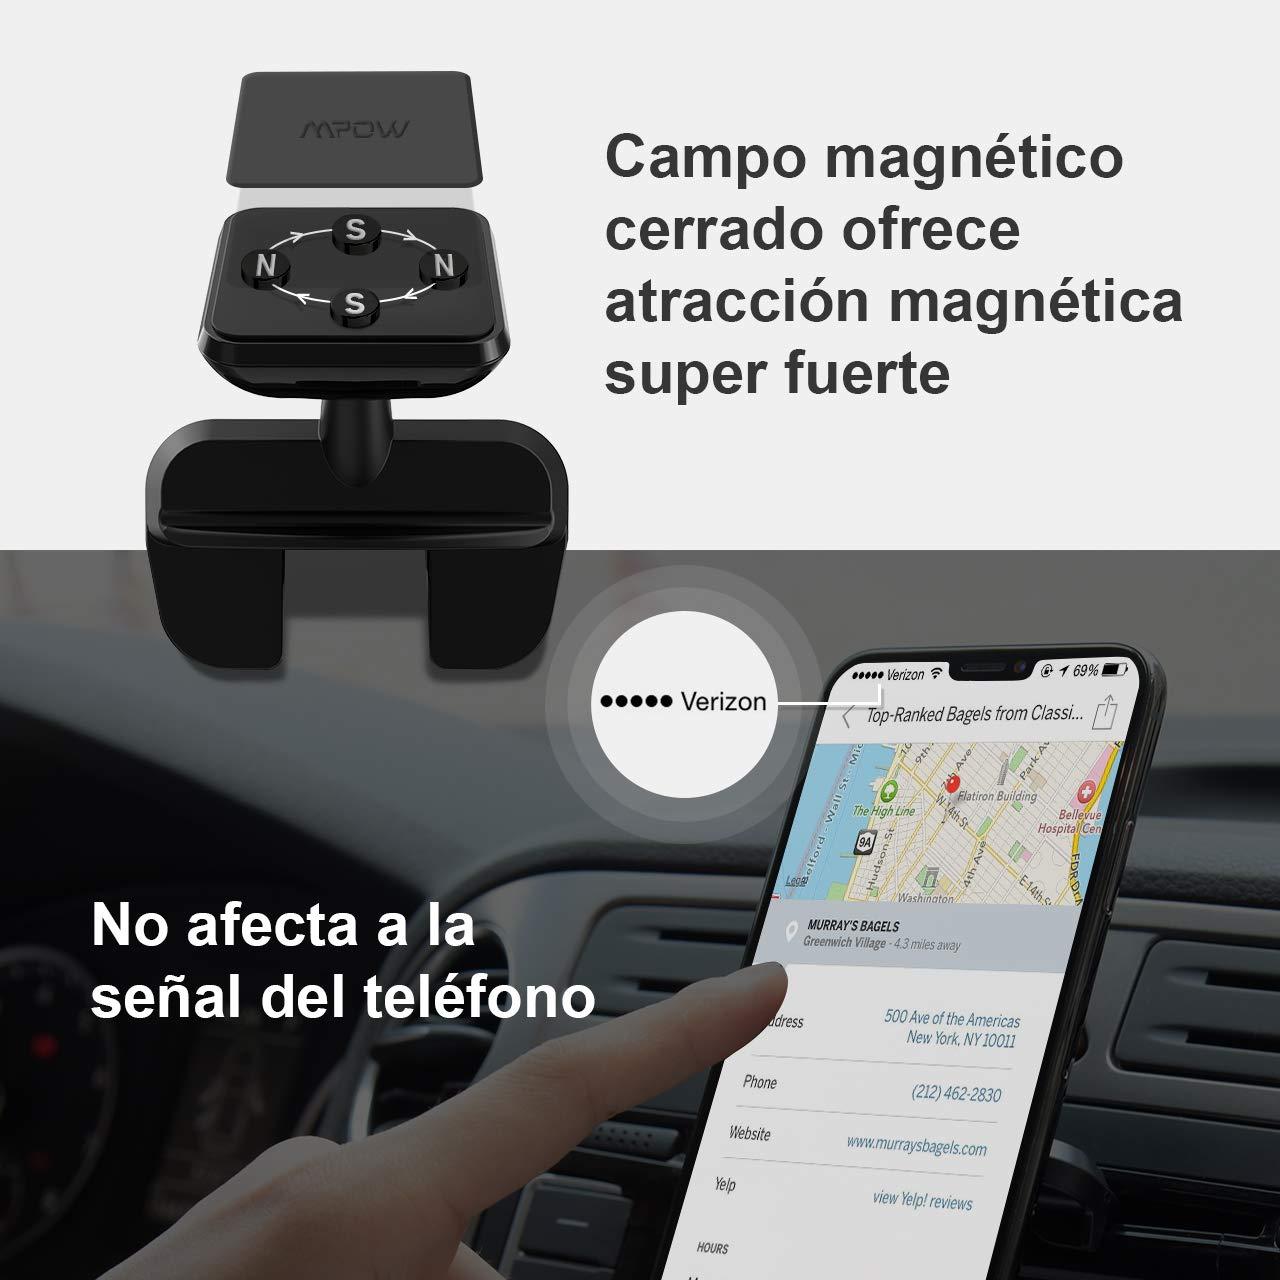 Mpow Soporte Magnético de Móvil para Coche, con Imán para Ranura CD, para iPhone XS/X/8/7/6, Samsung S9/S8, Huawei y ect.: Amazon.es: Electrónica